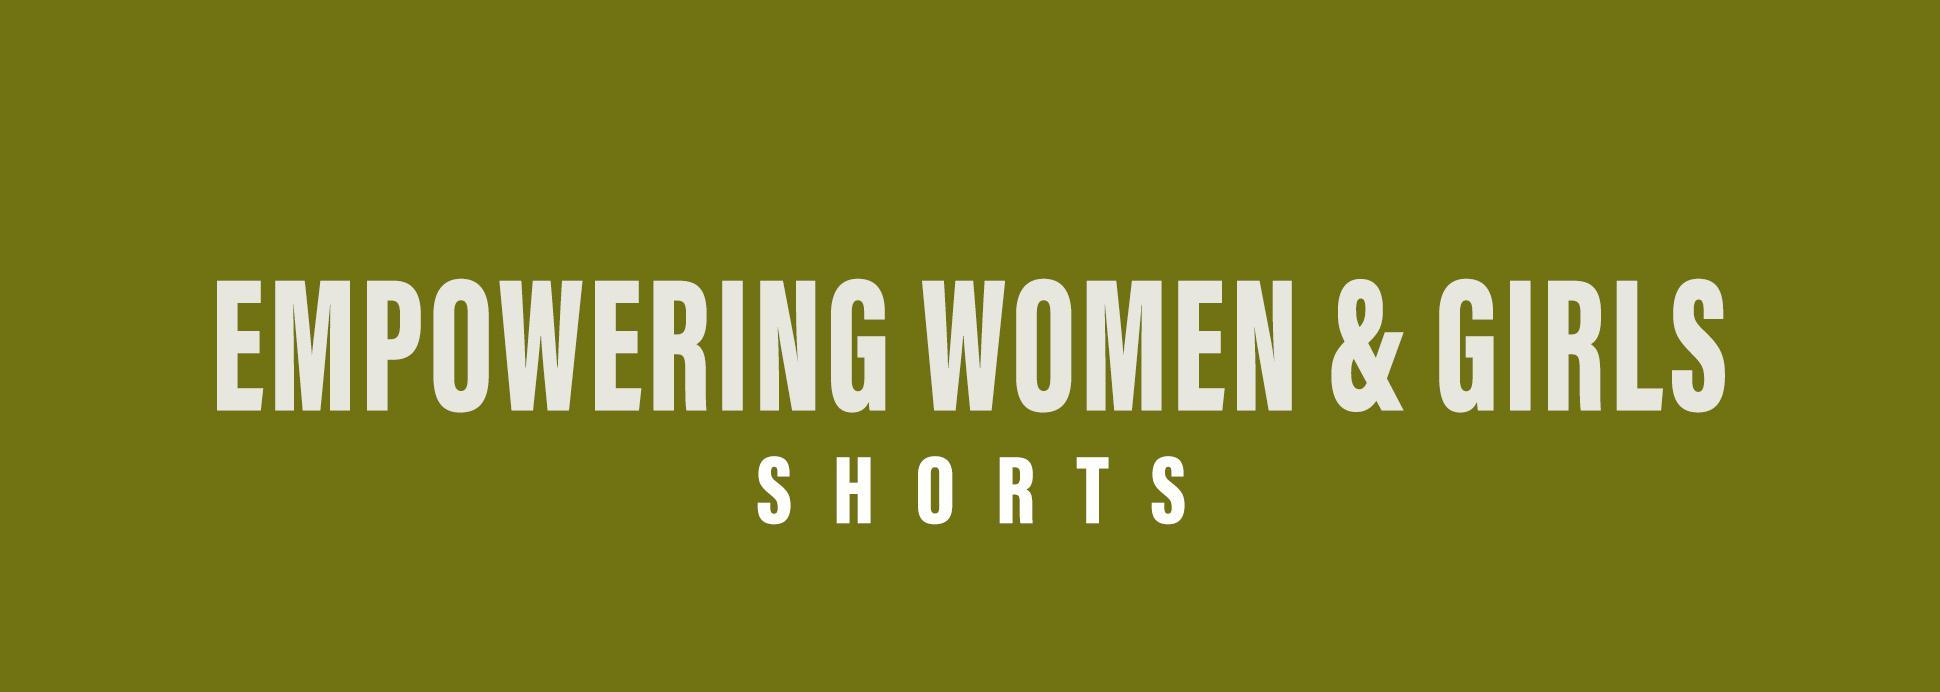 Shorts: Empowering Women and Girls